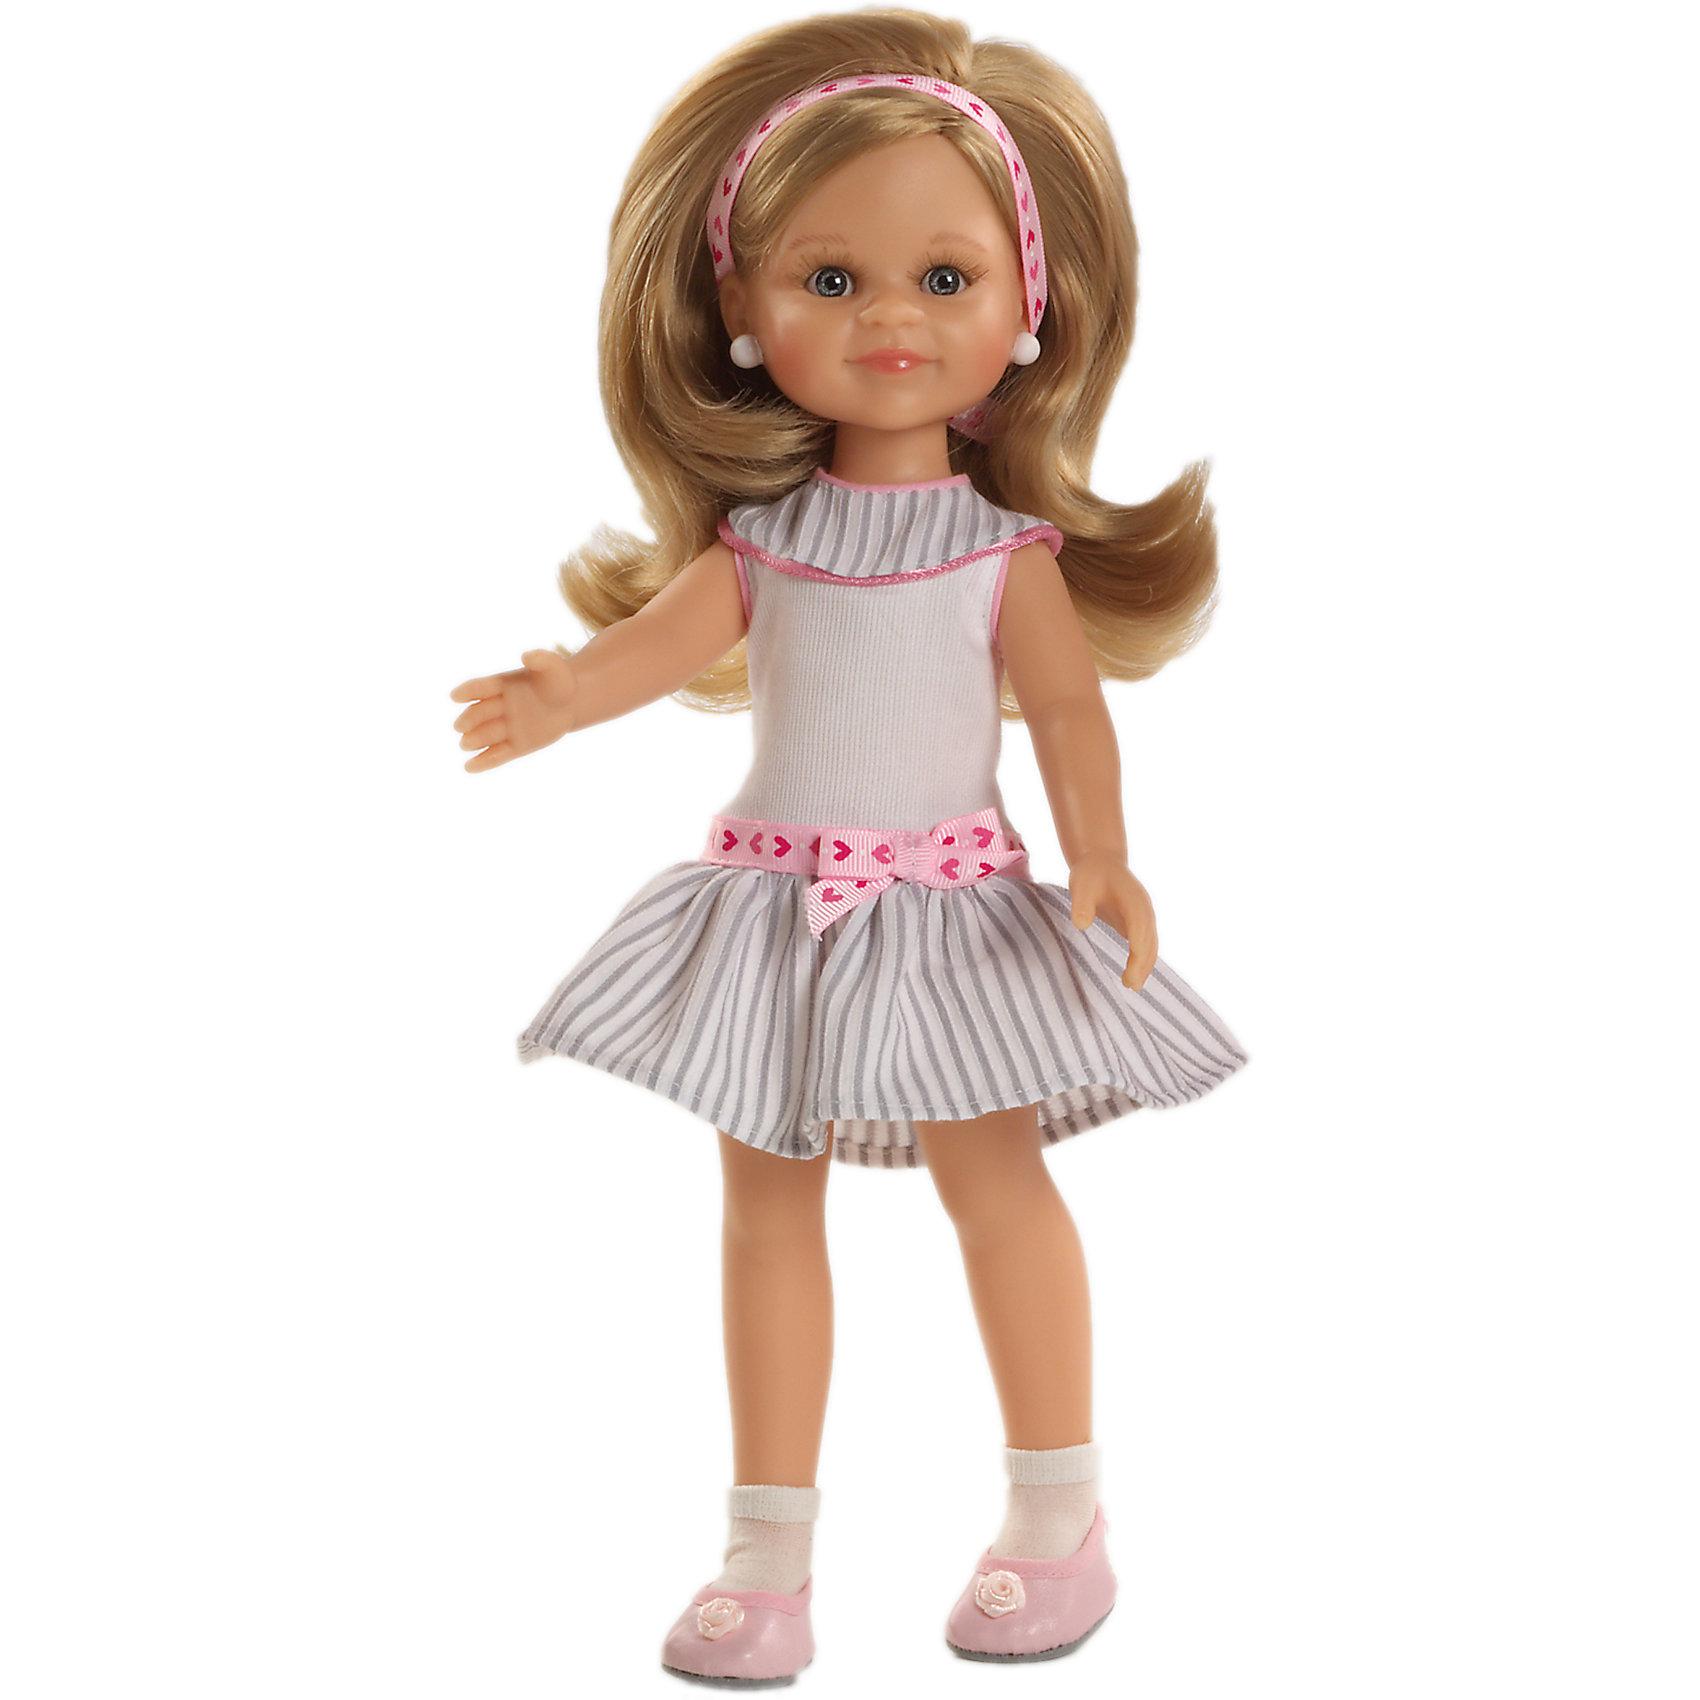 Paola Reina Кукла Клэр, 32 см, Paola Reina кукла пупс без одежды 22см 31014 paola reina